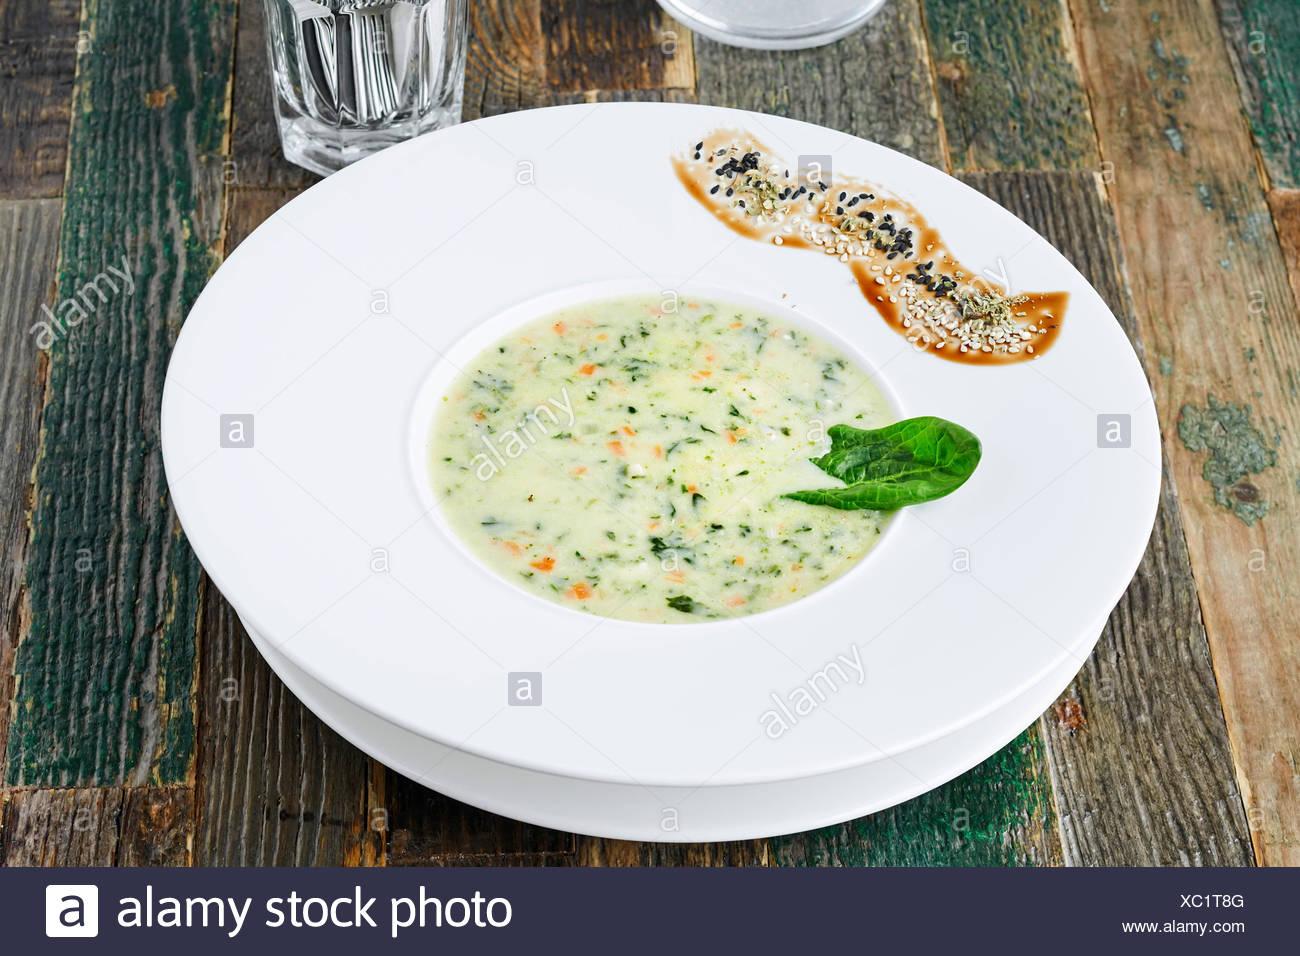 Sopa de calabacín sobre tabla de madera, horizontales shot Imagen De Stock